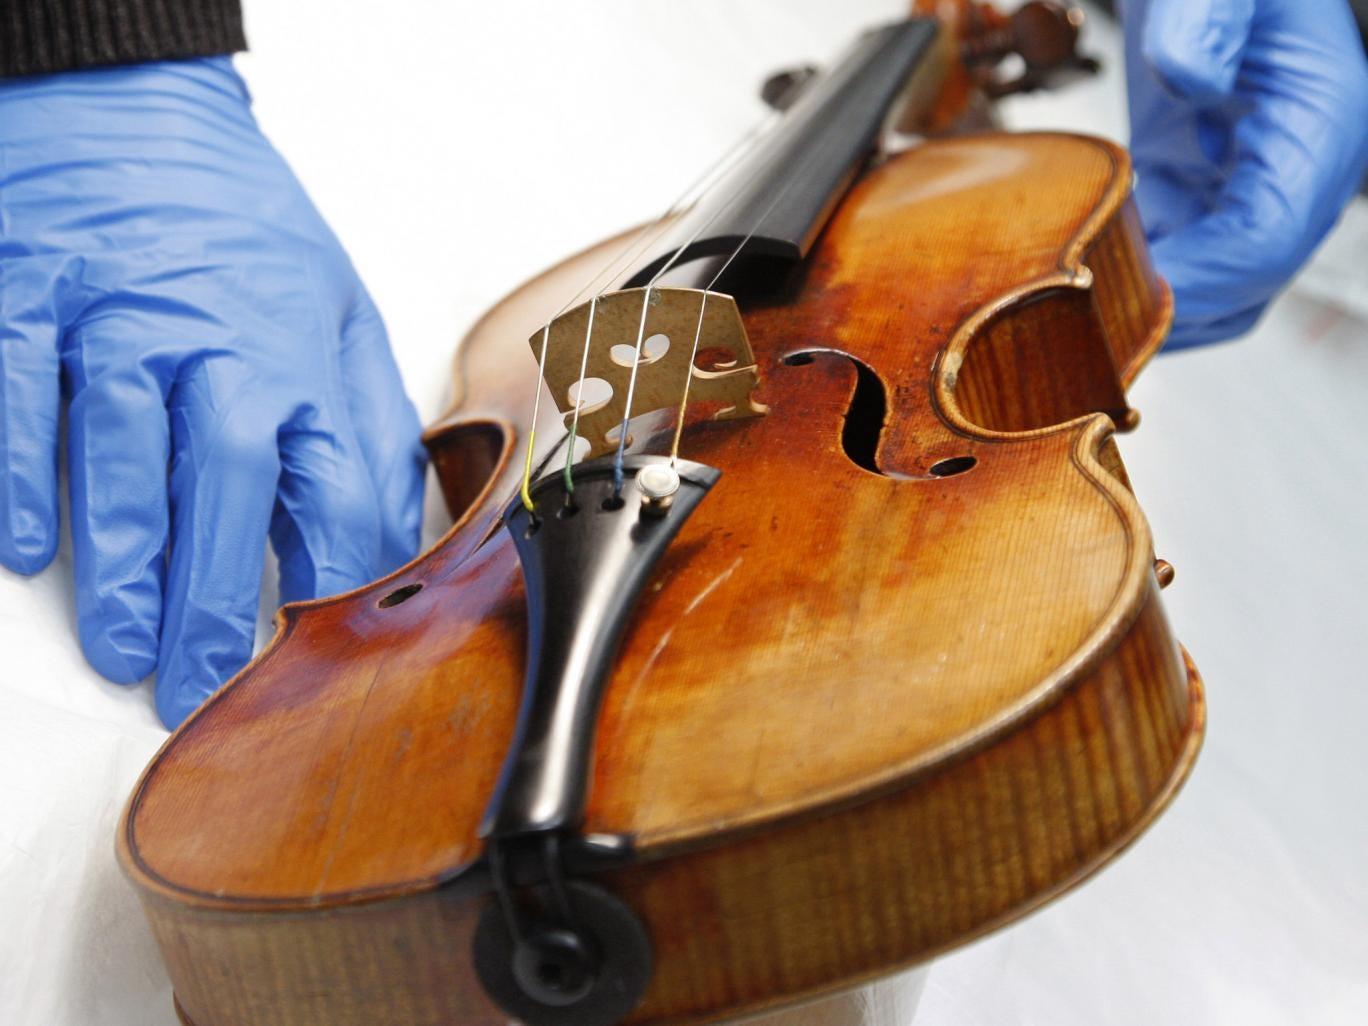 A Stradivarius violin at the restoration and research laboratory of the Musee de la Musique in Paris